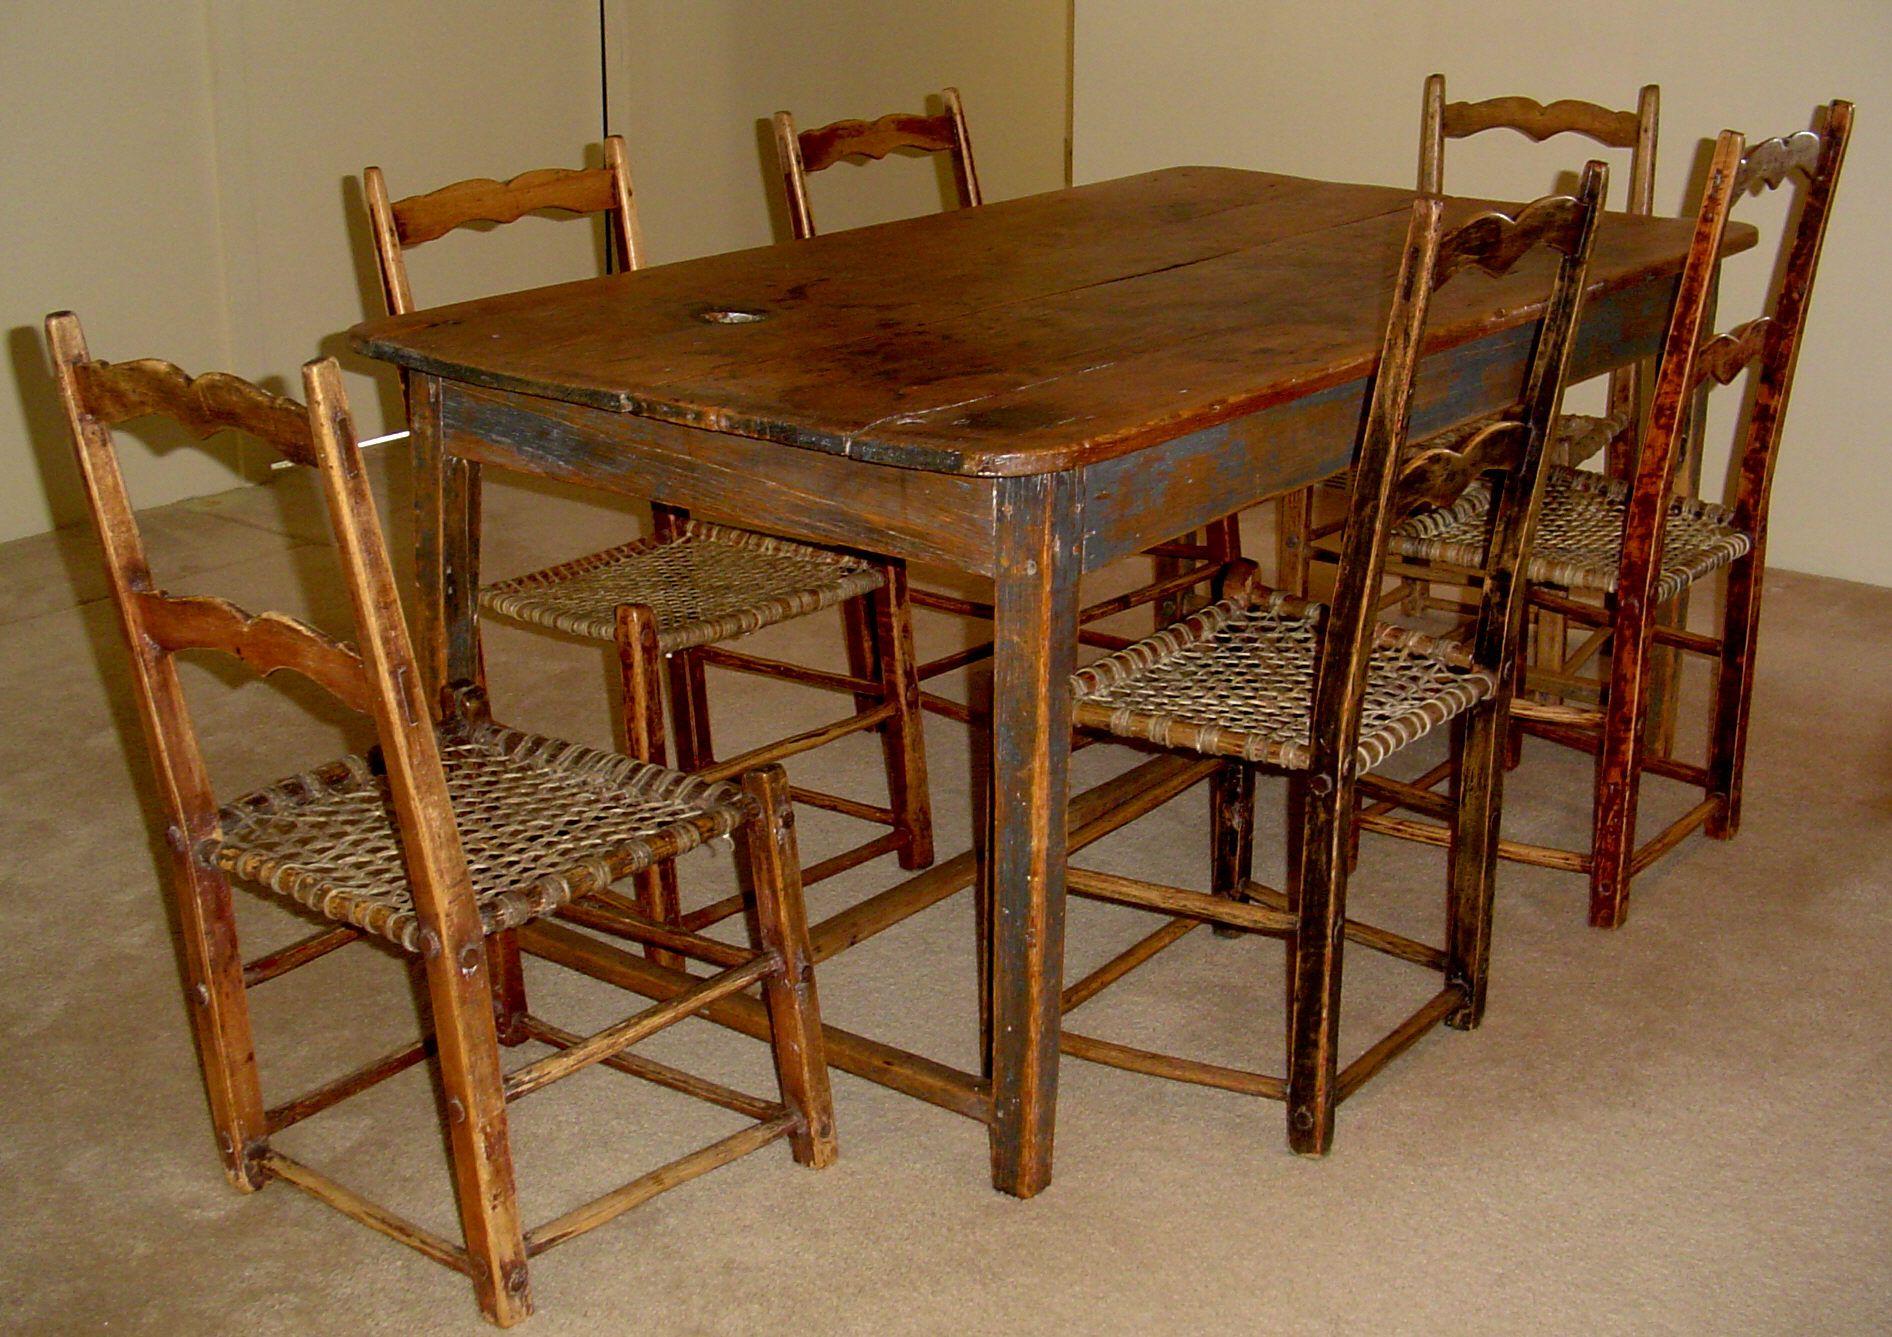 Primitive Kitchen Table Kitchen chairs for sale, Kitchen